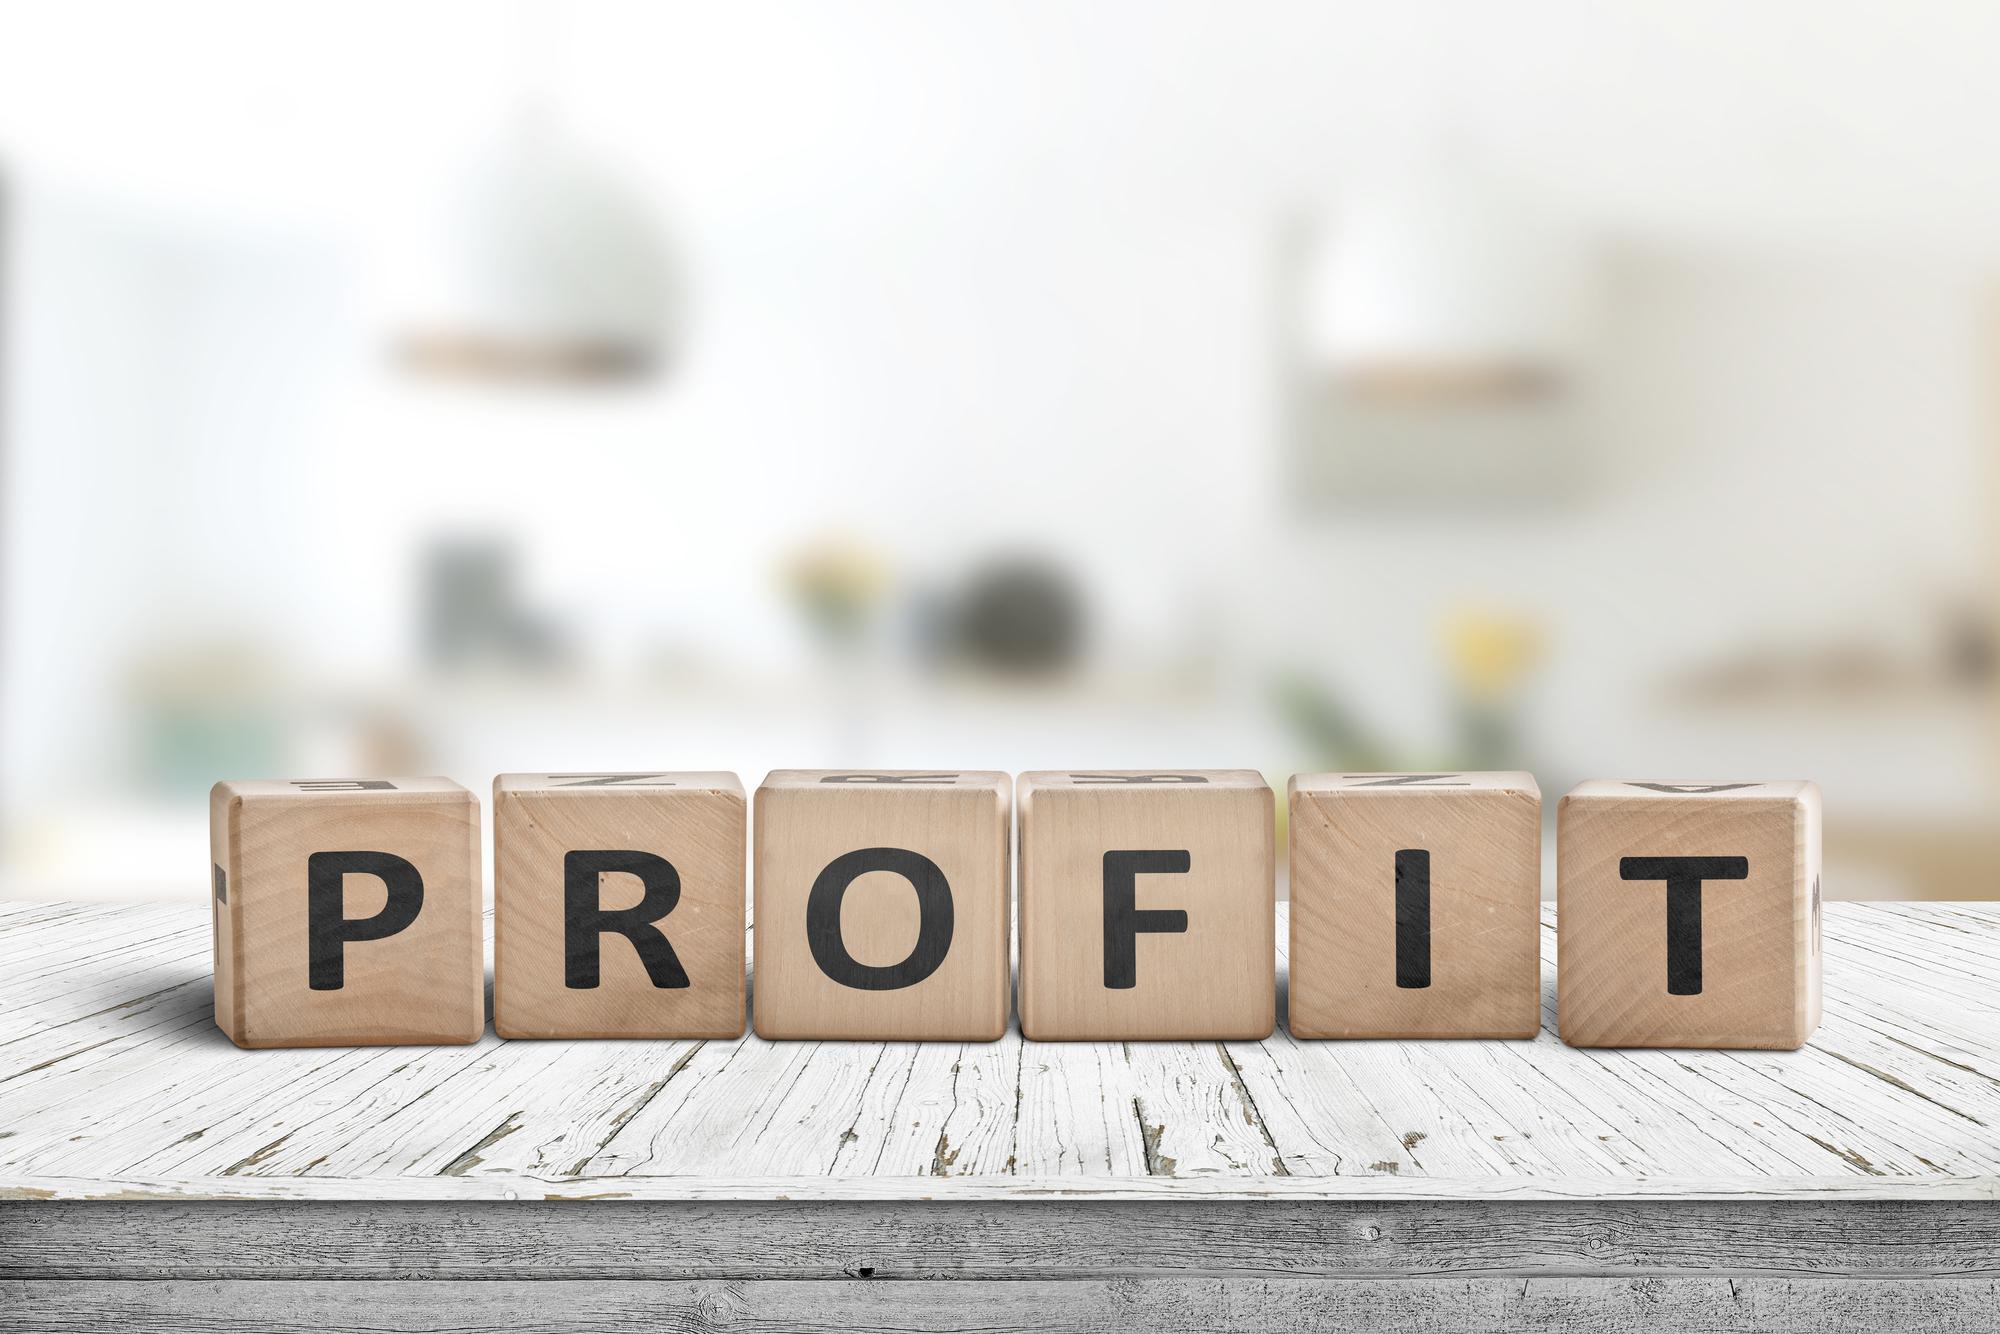 利益 profit